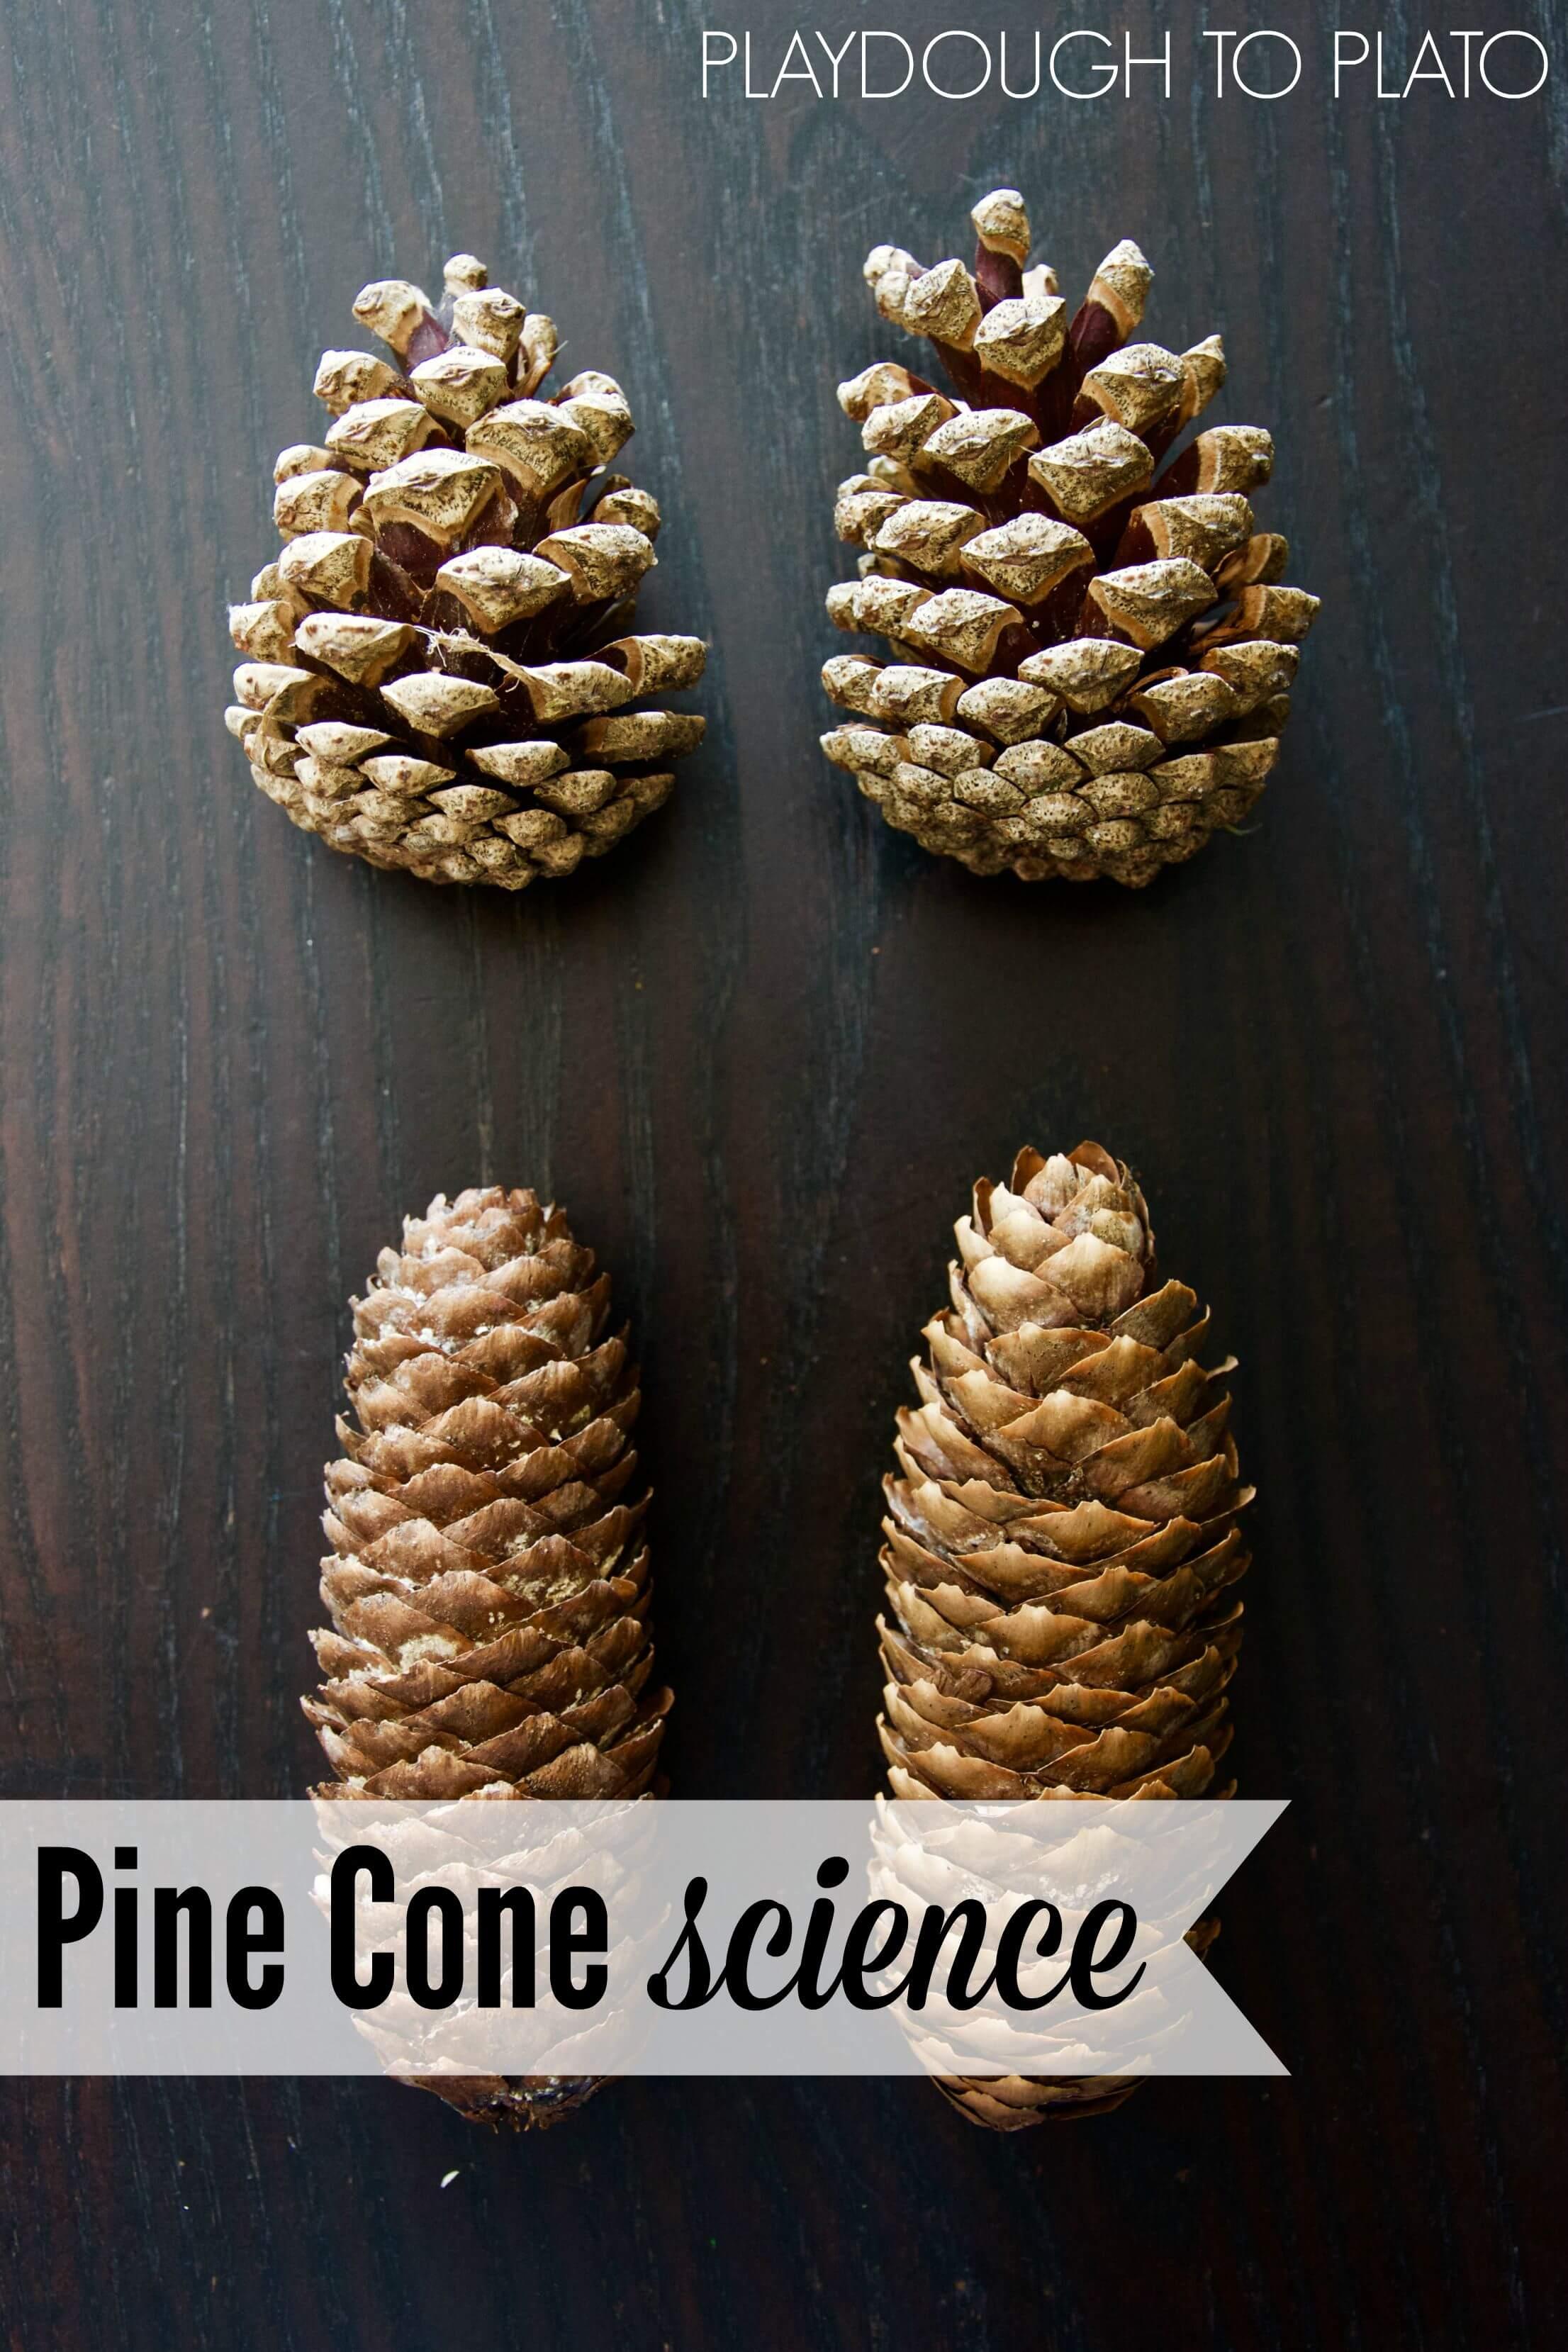 Pine Cone Science Playdough To Plato